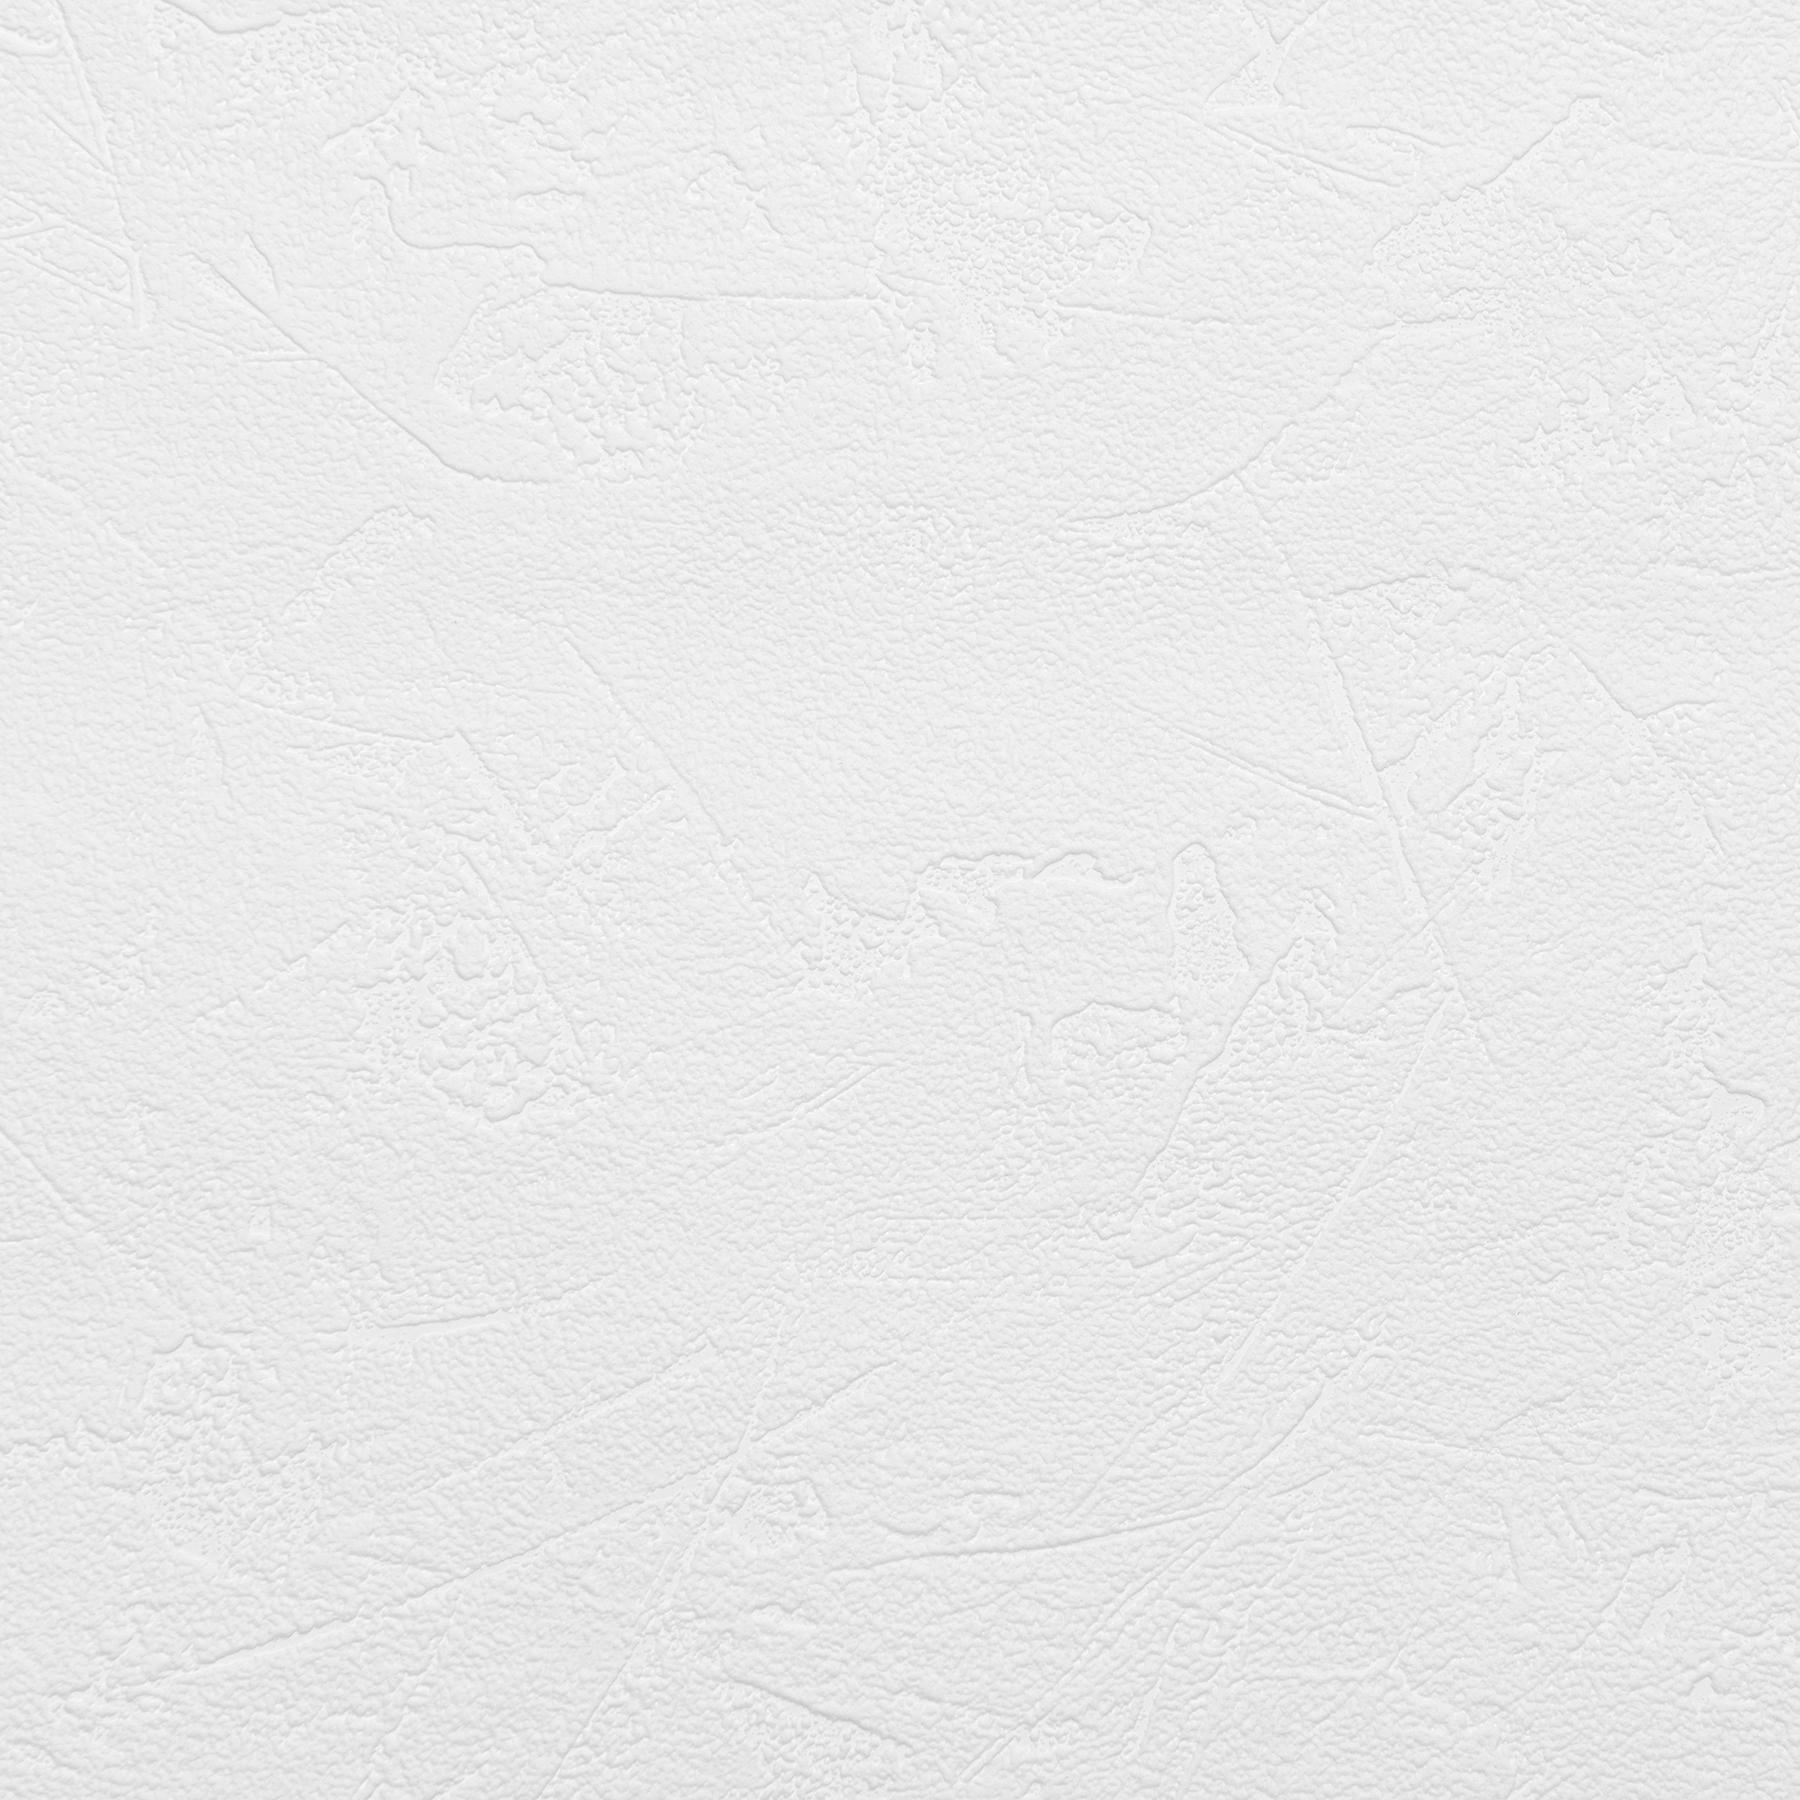 Picture of Brier Paintable Plaster Texture Wallpaper